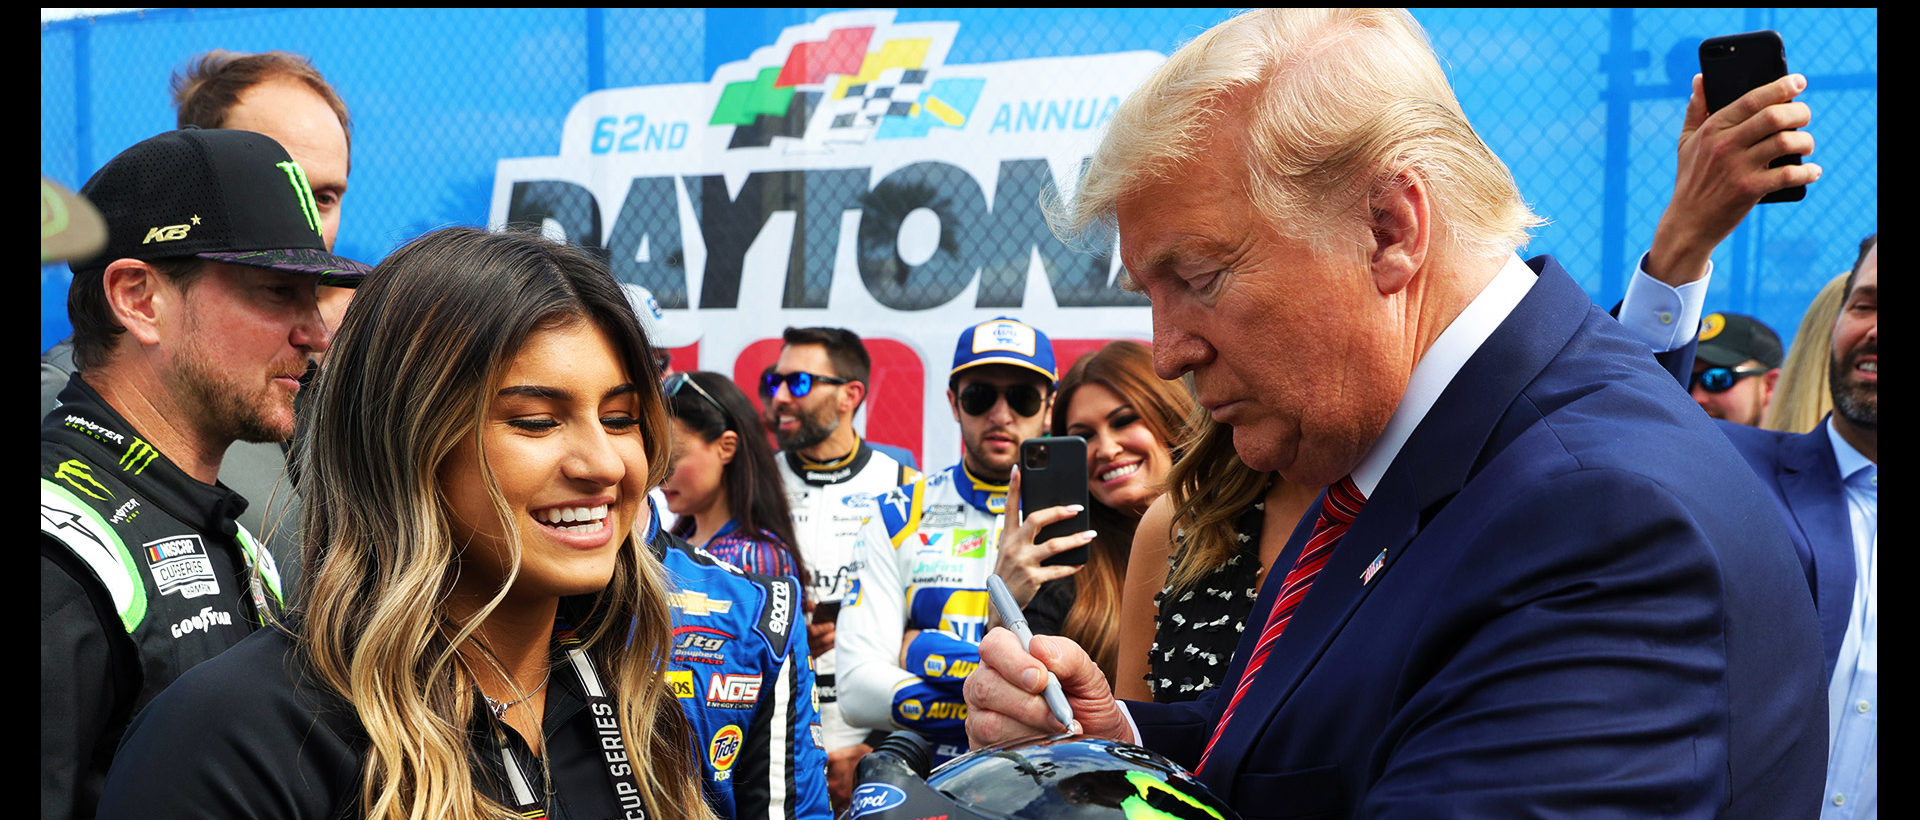 The Daytona 500 Was Full Of God, Family...